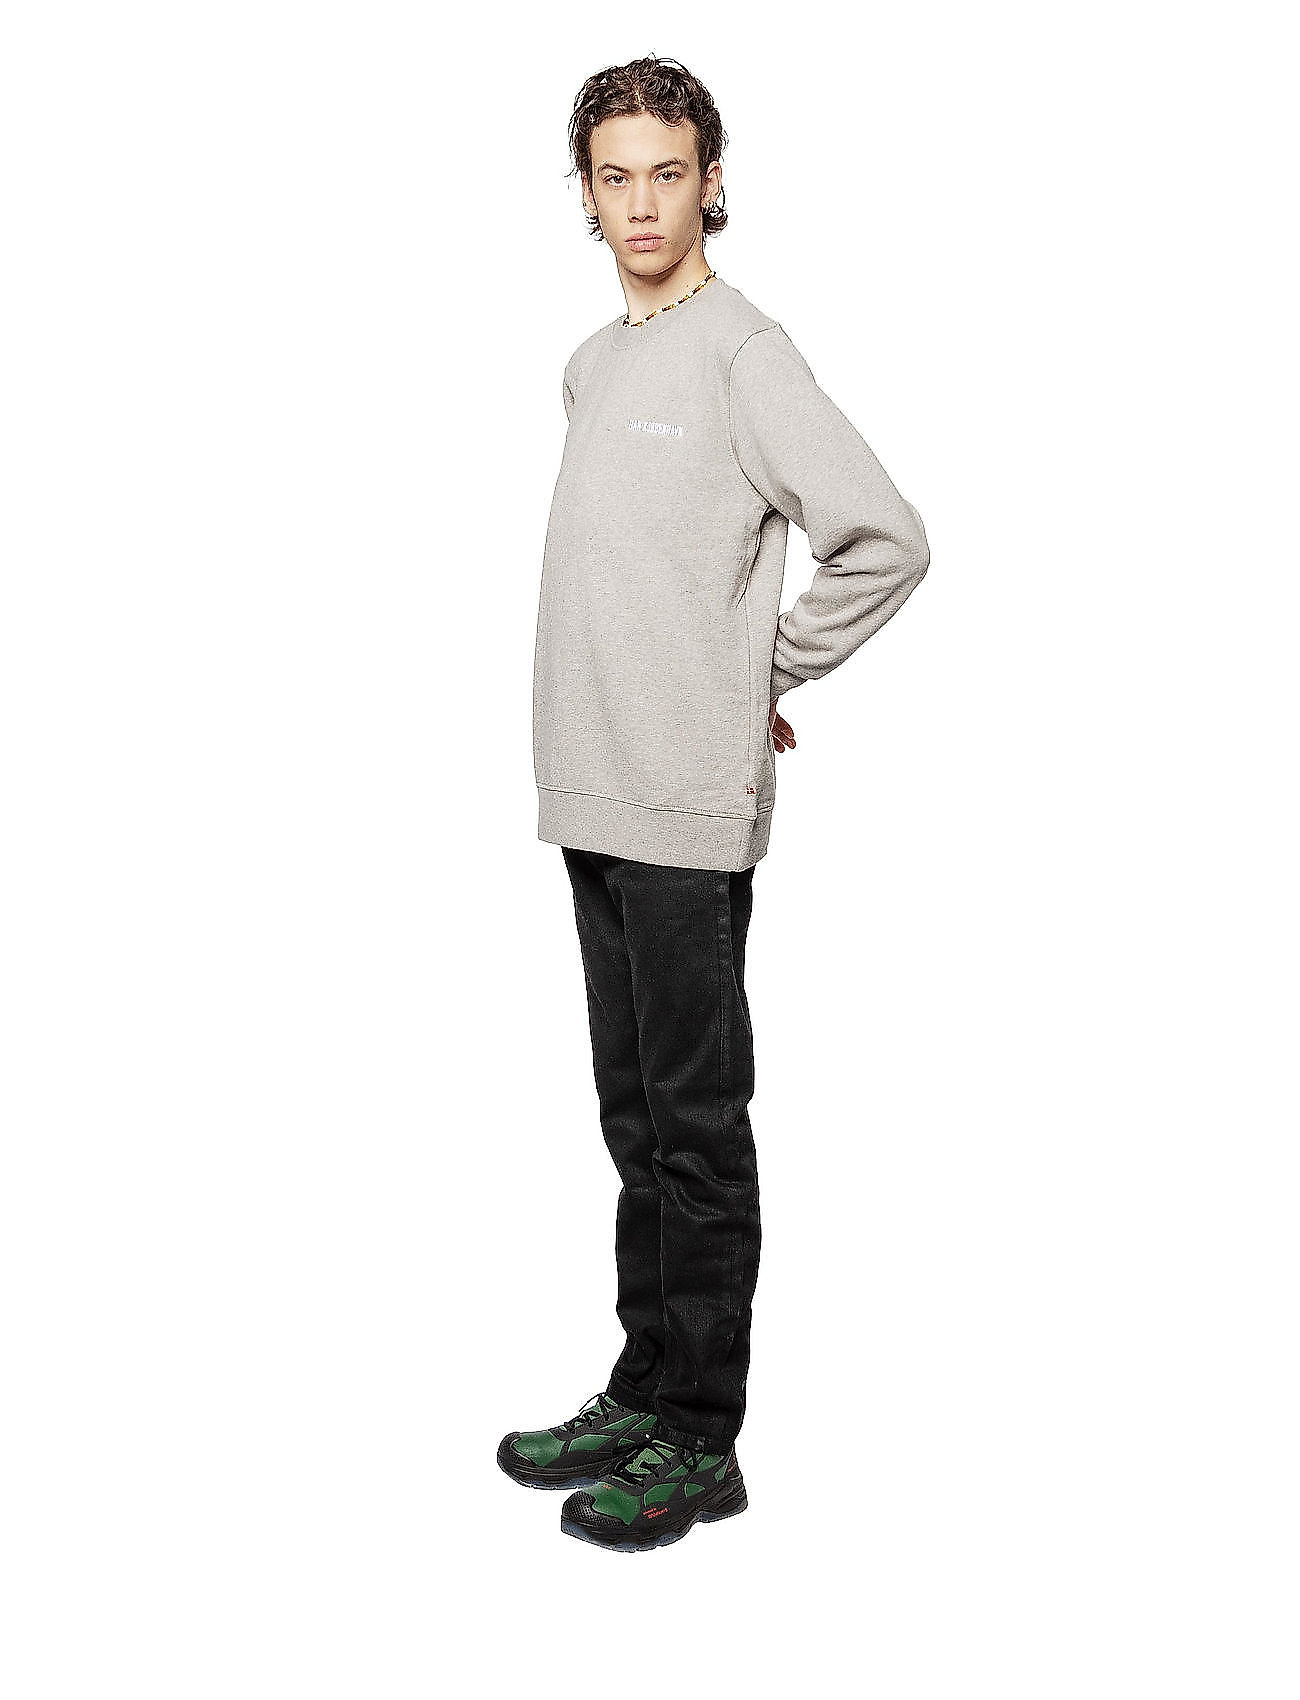 HAN Kjøbenhavn Casual Crew - Sweatshirts GREY LOGO - Menn Klær